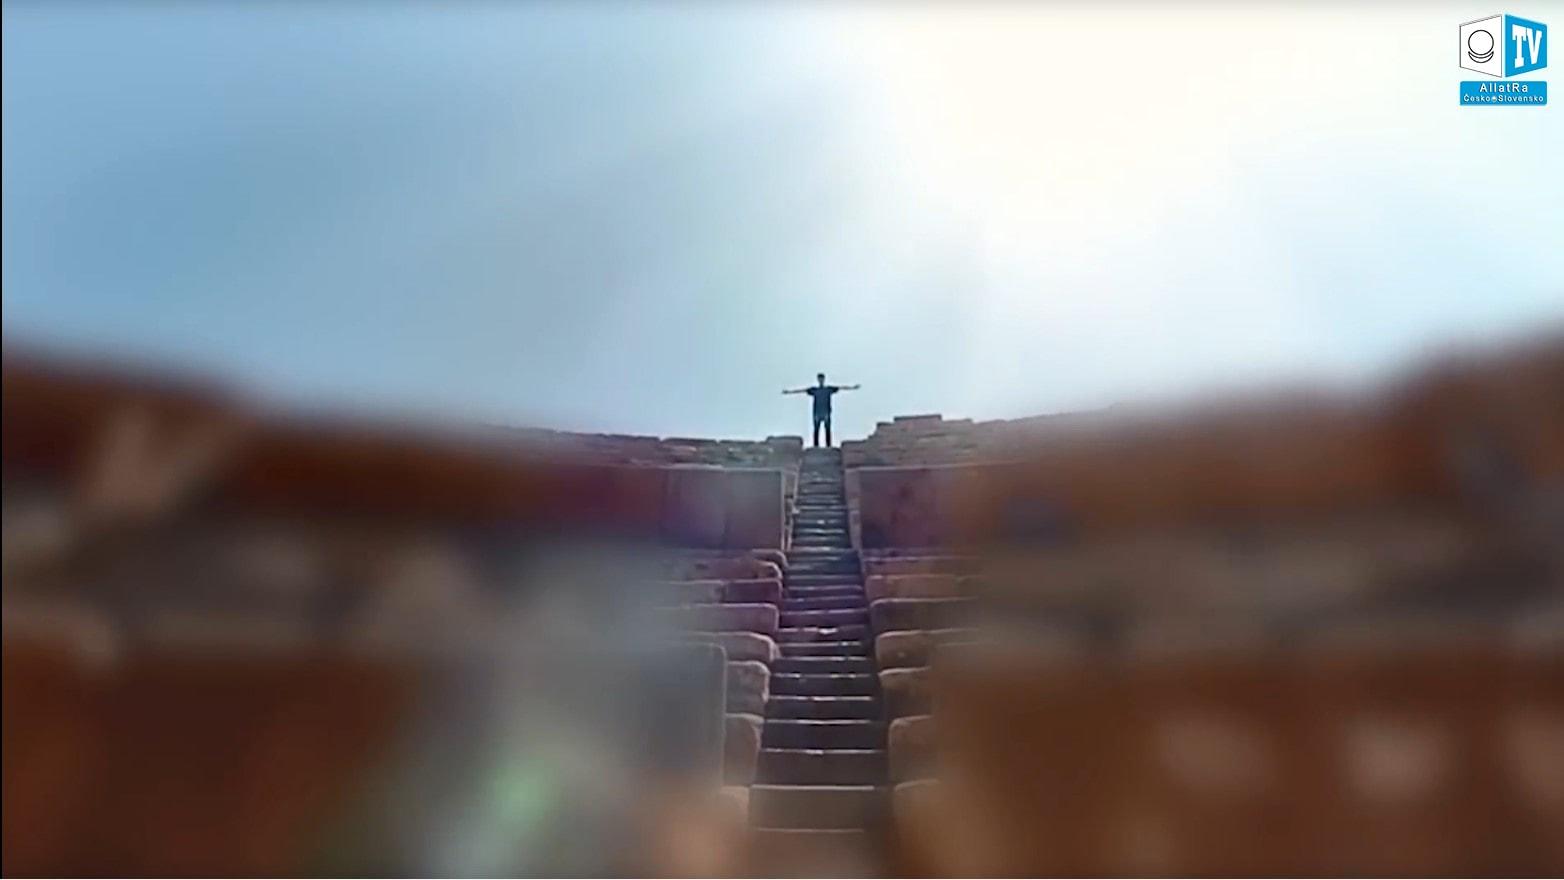 Duchovní rozvoj. Foto